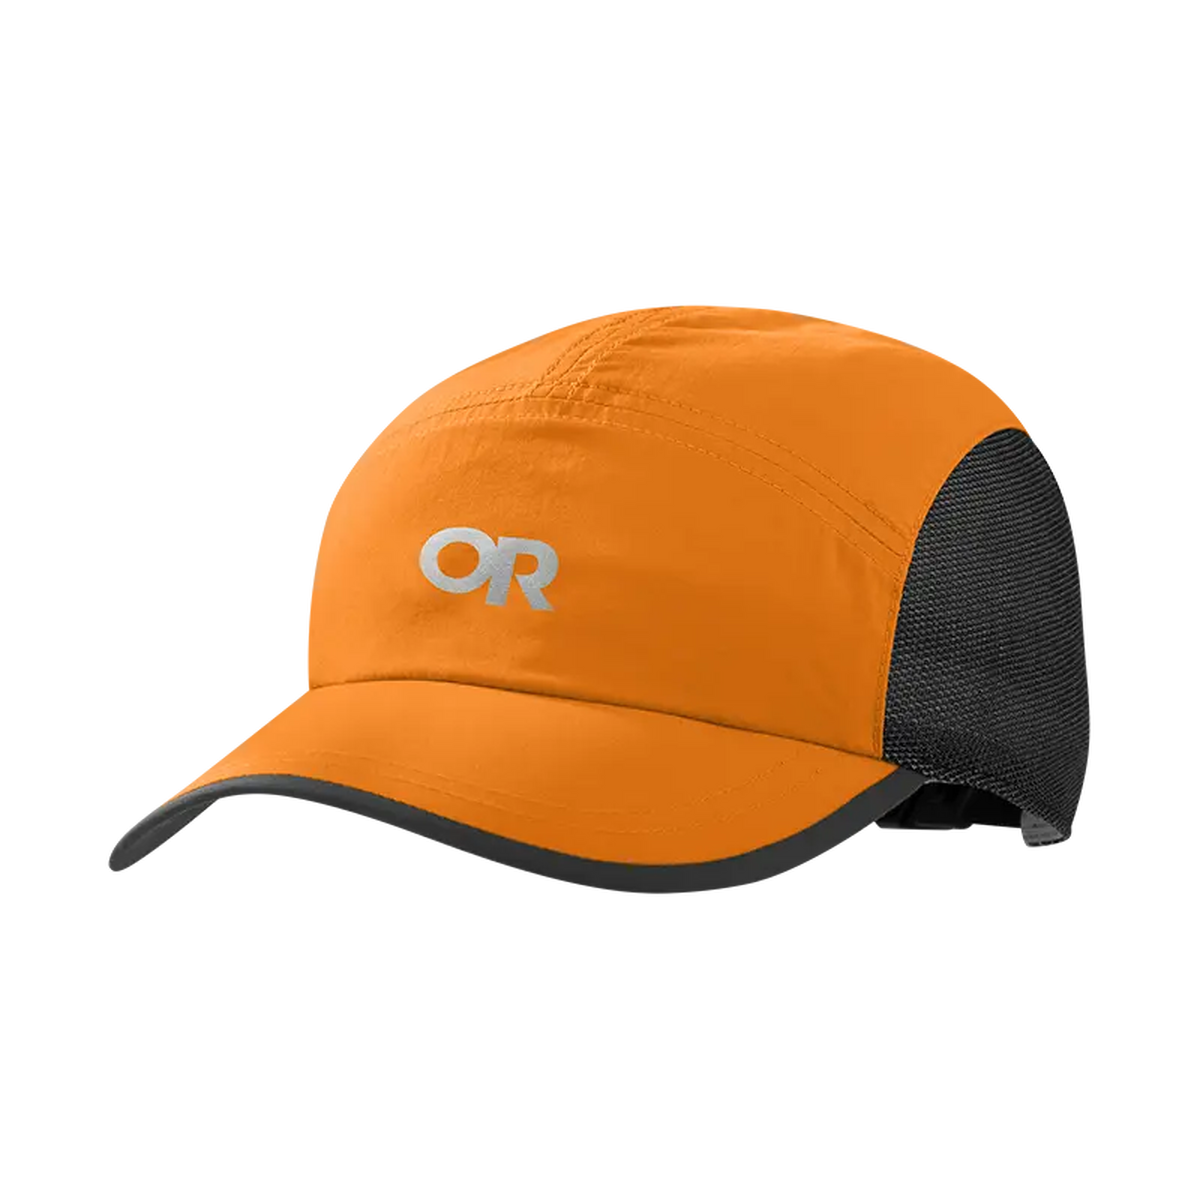 Outdoor Research Unisex Swift Cap - Orange You Glad